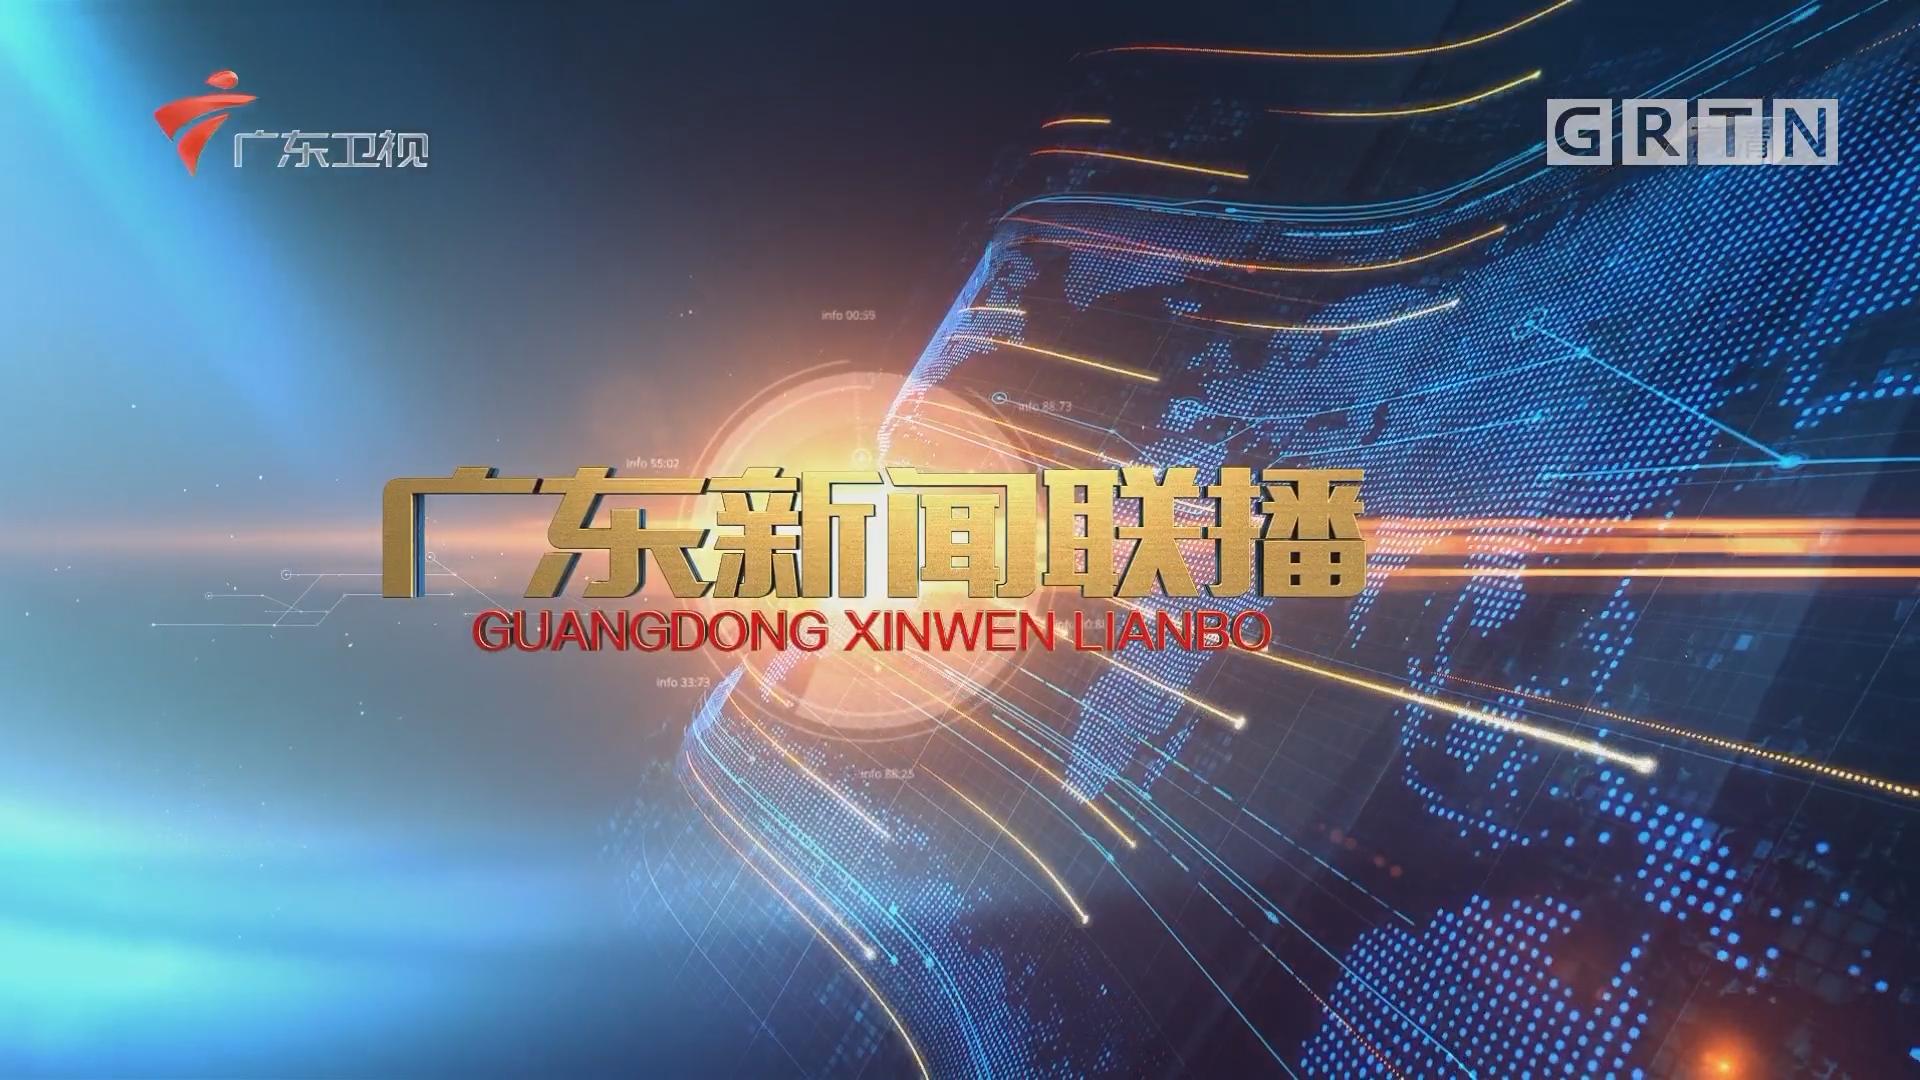 [HD][2018-02-26]广东新闻联播:第二十三届冬季奥林匹克运动会在韩国平昌闭幕 习近平通过视频欢迎全世界的朋友2022年相约北京